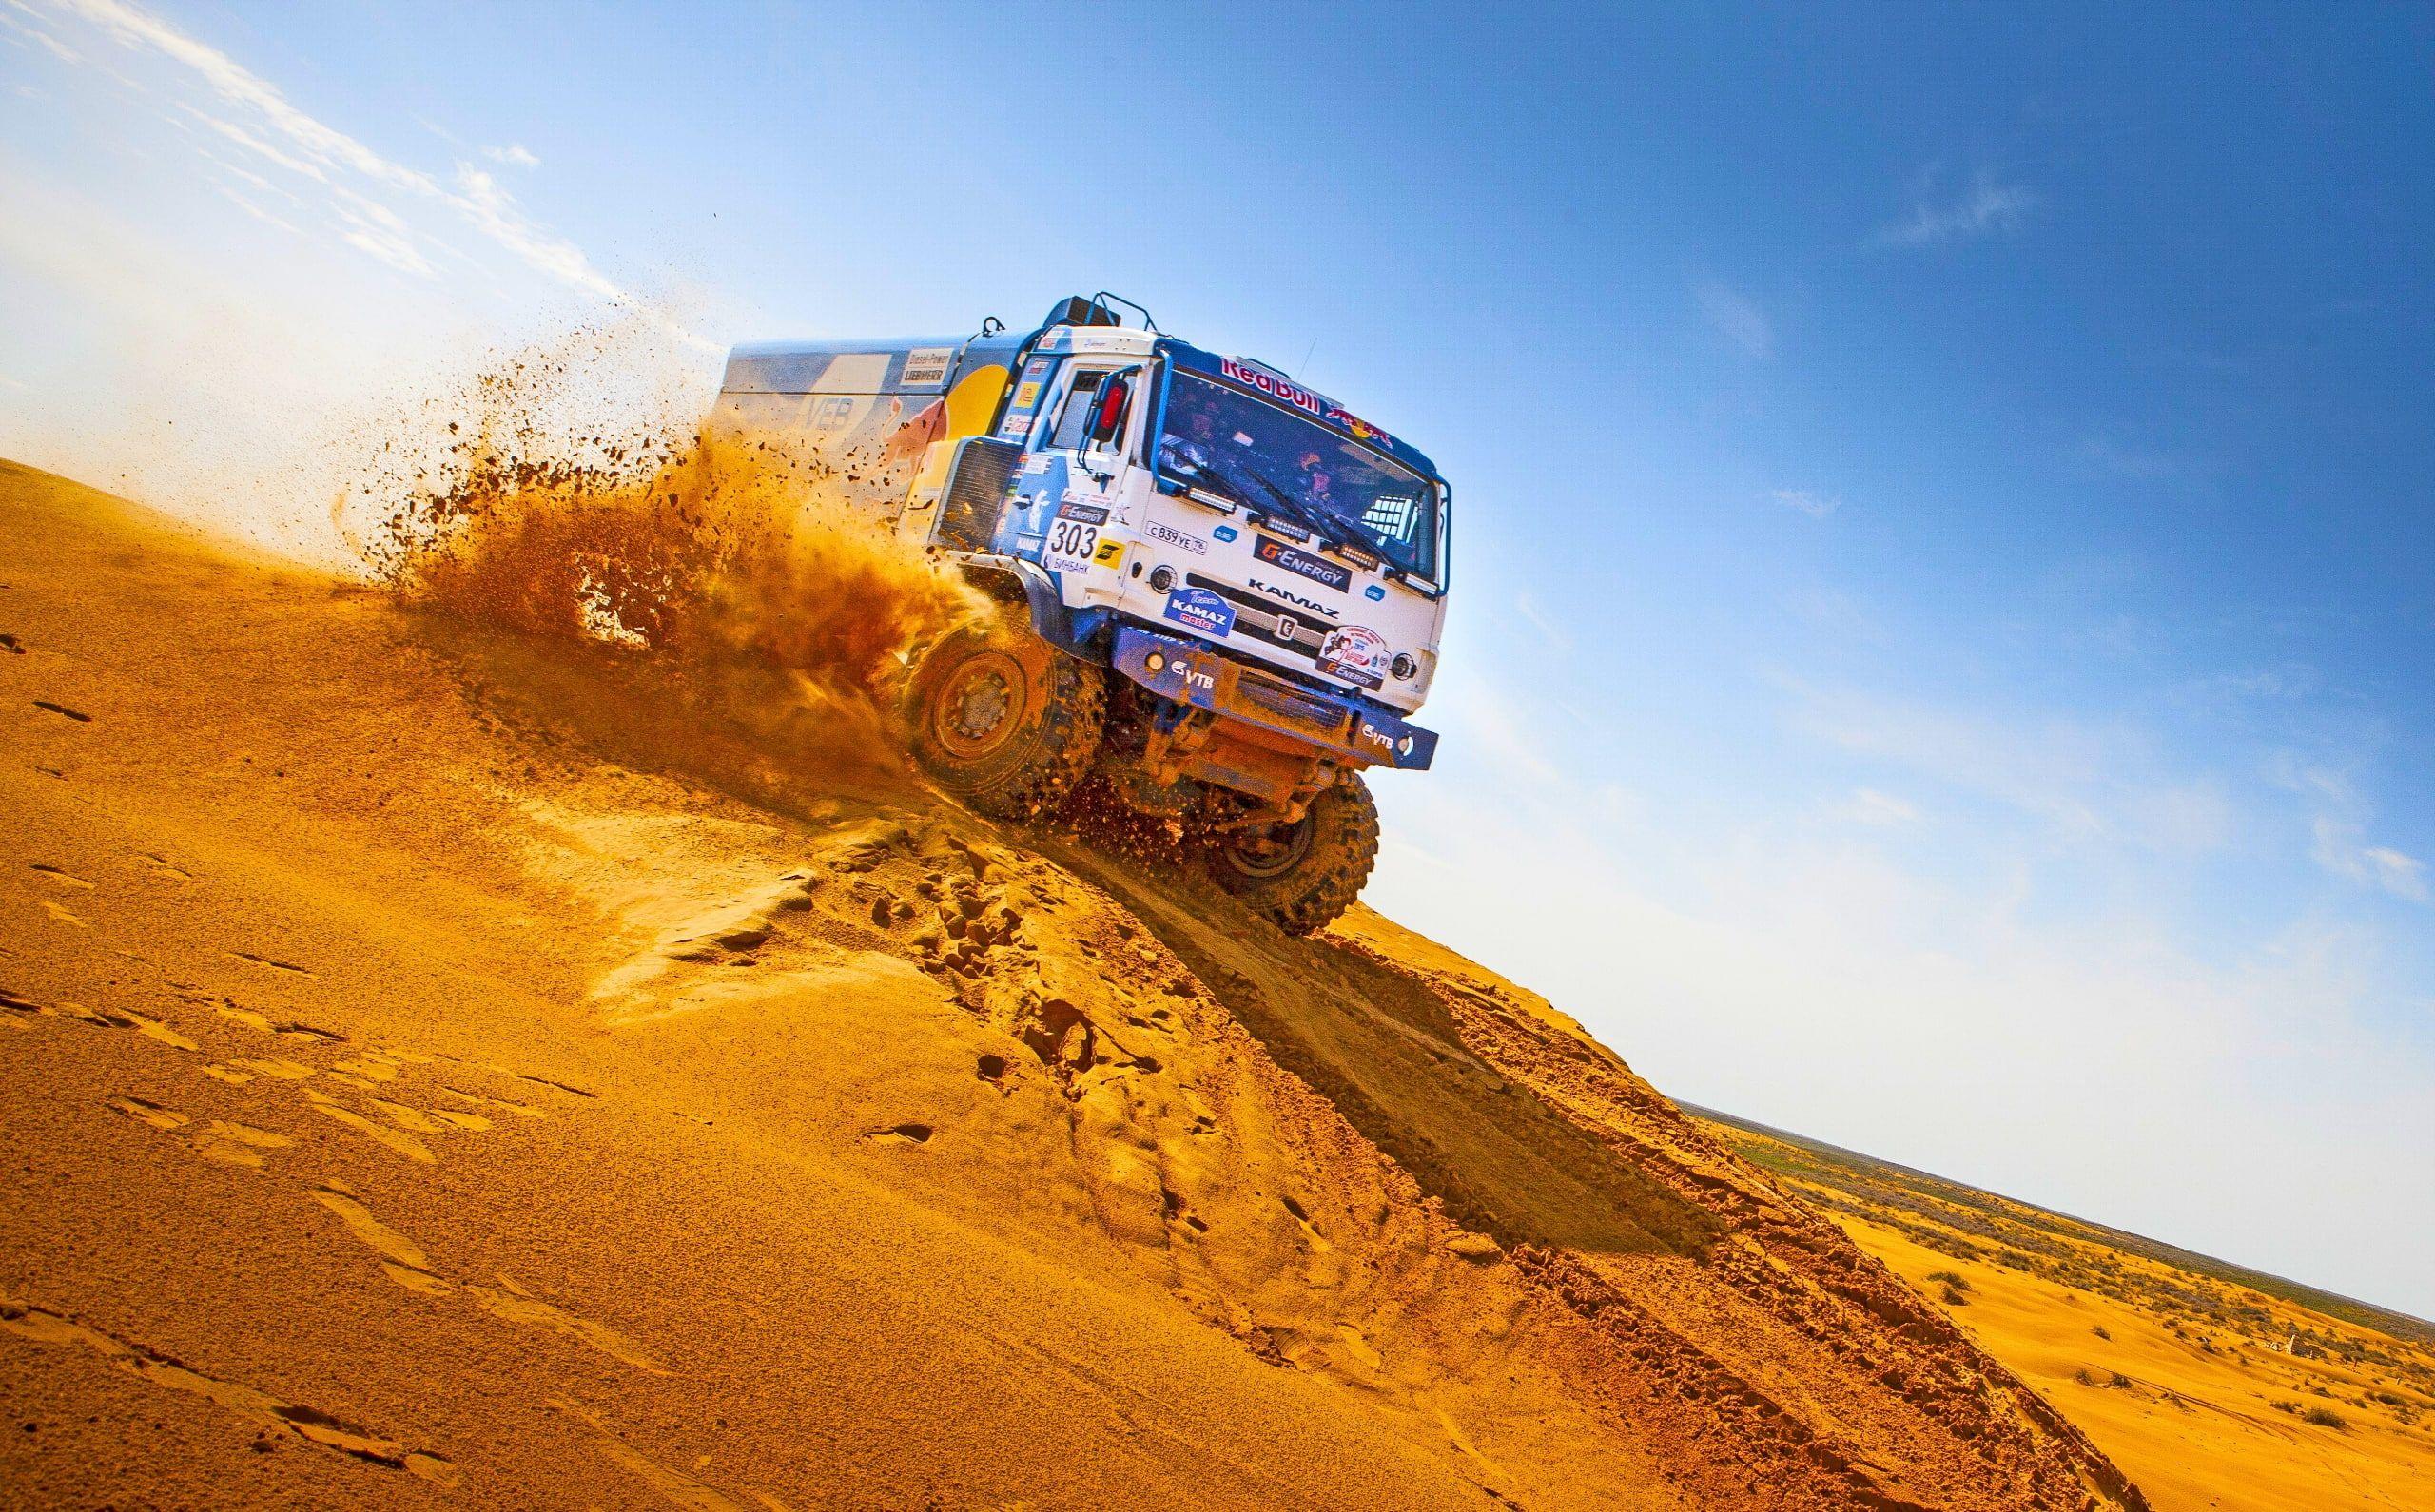 Desert Rally Truck Vehicle Racing Dakar Rally Kamaz 2k Wallpaper Hdwallpaper Desktop In 2021 Dakar Racing Hd Wallpaper